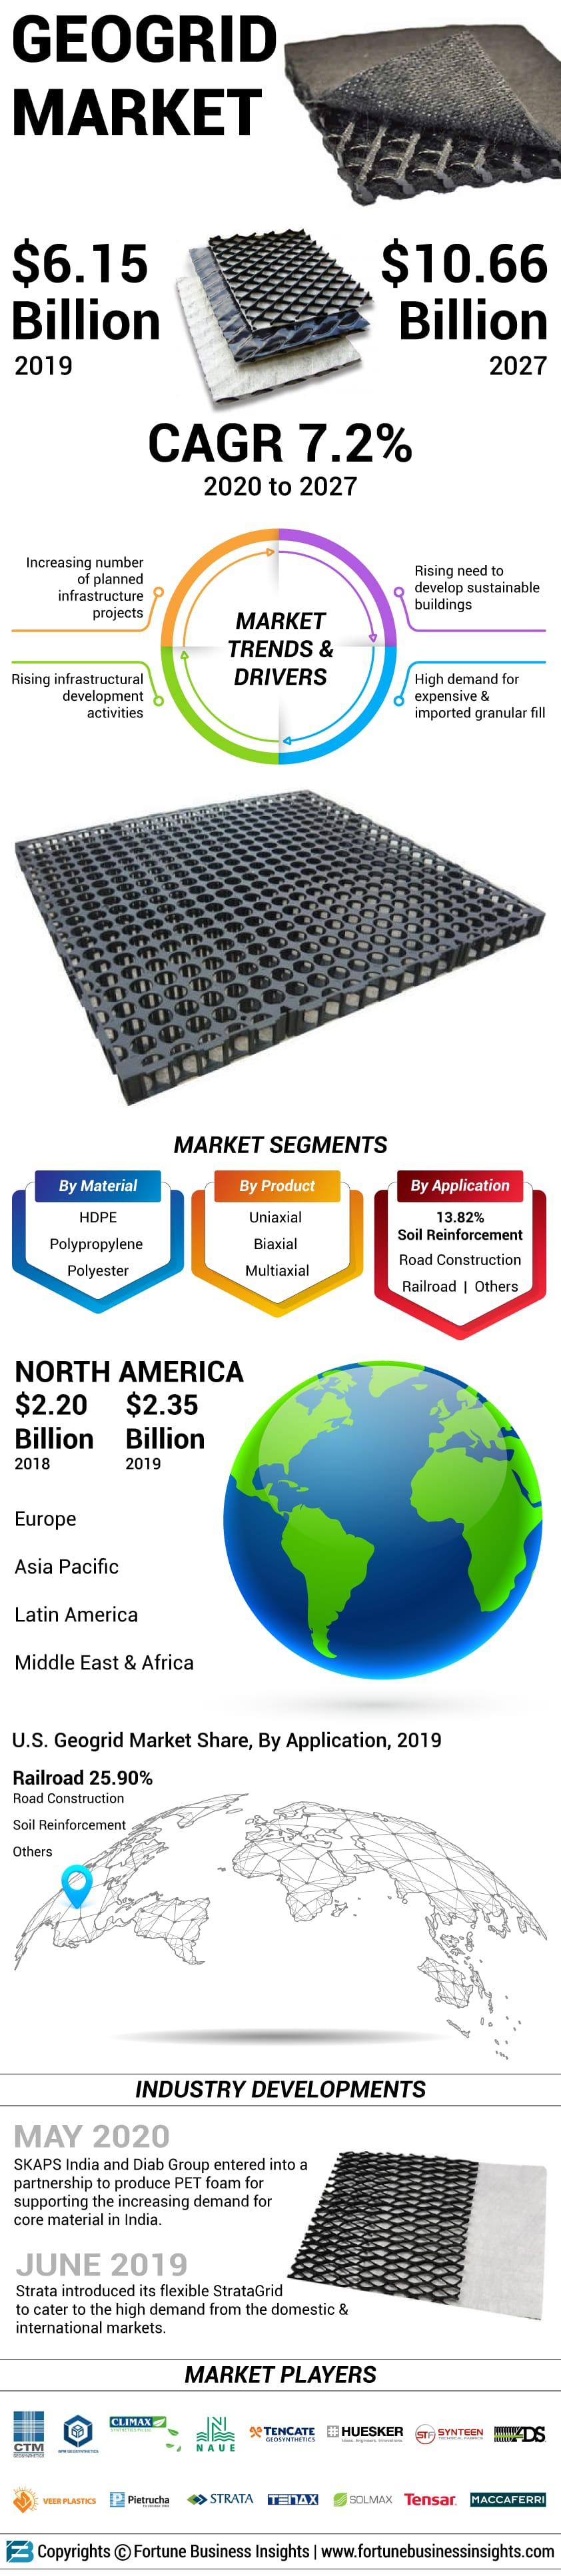 Geogrid Market